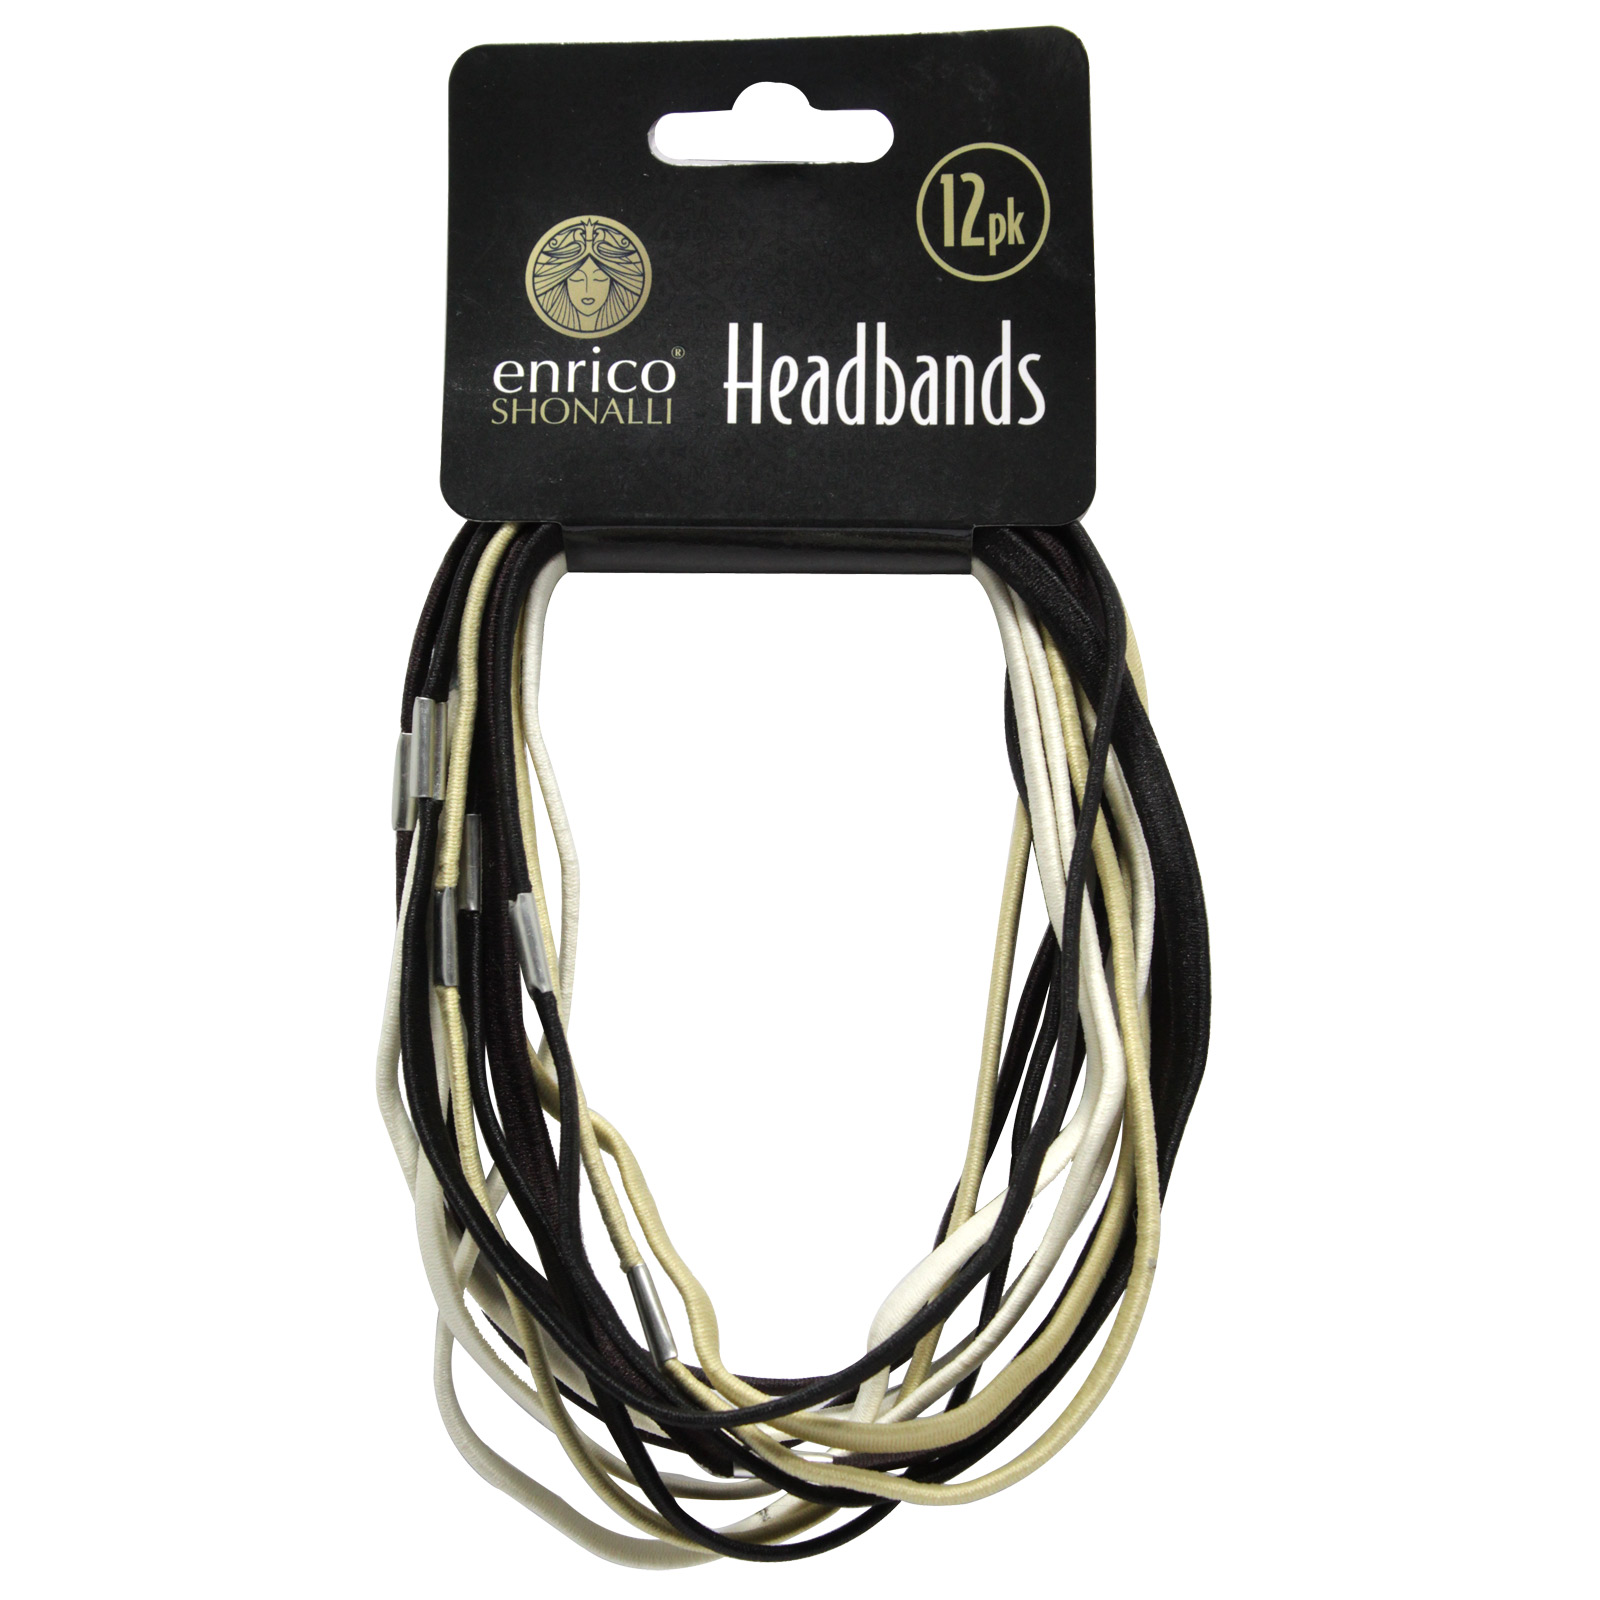 ENRICO HEADBANDS 12PK BLACK-GOLD-SILVER